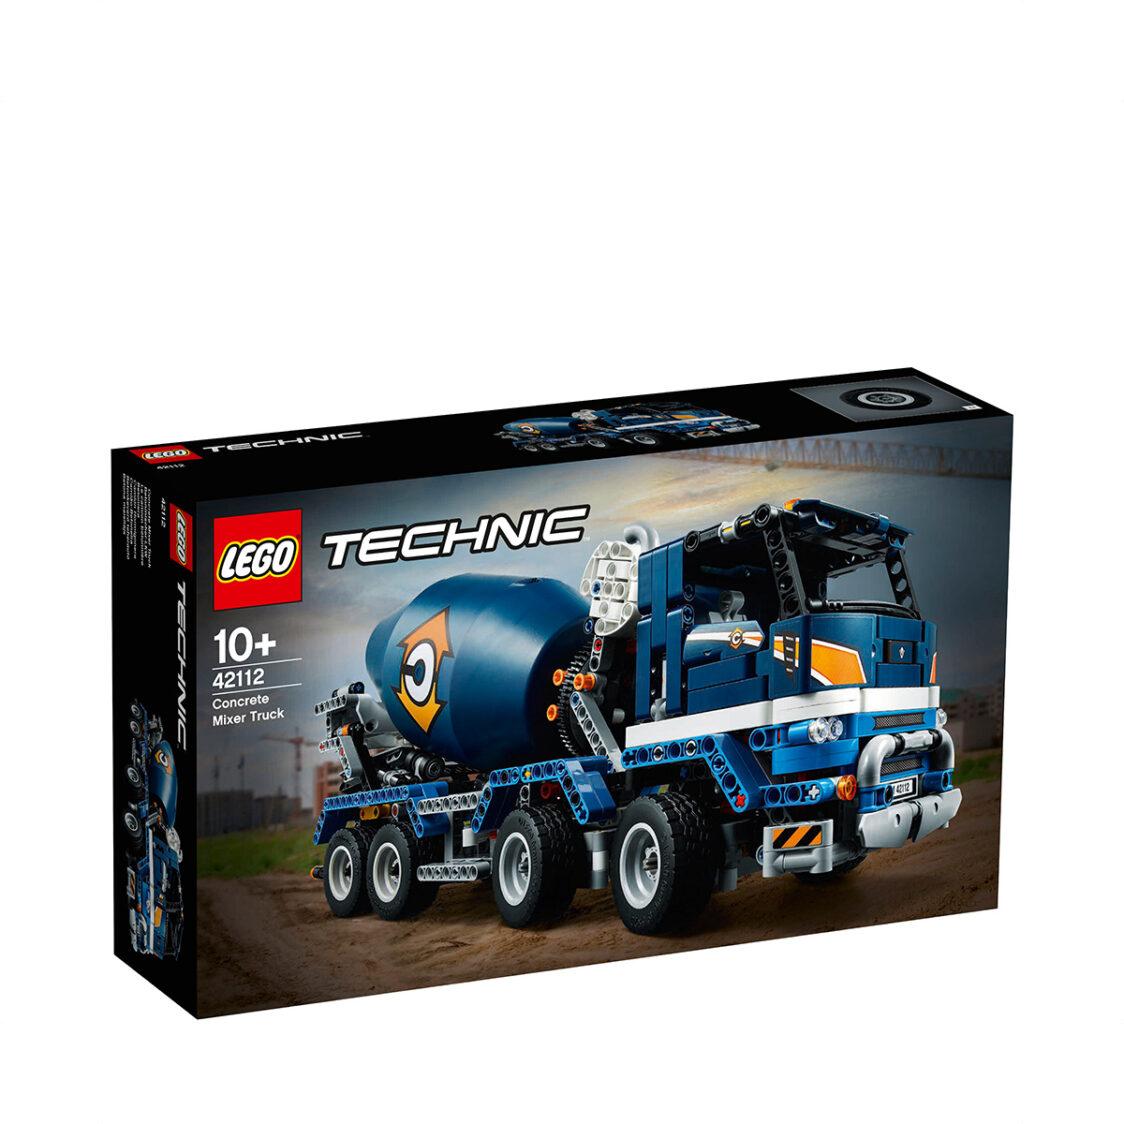 LEGO TECHNIC - Concrete Mixer Truck 42112